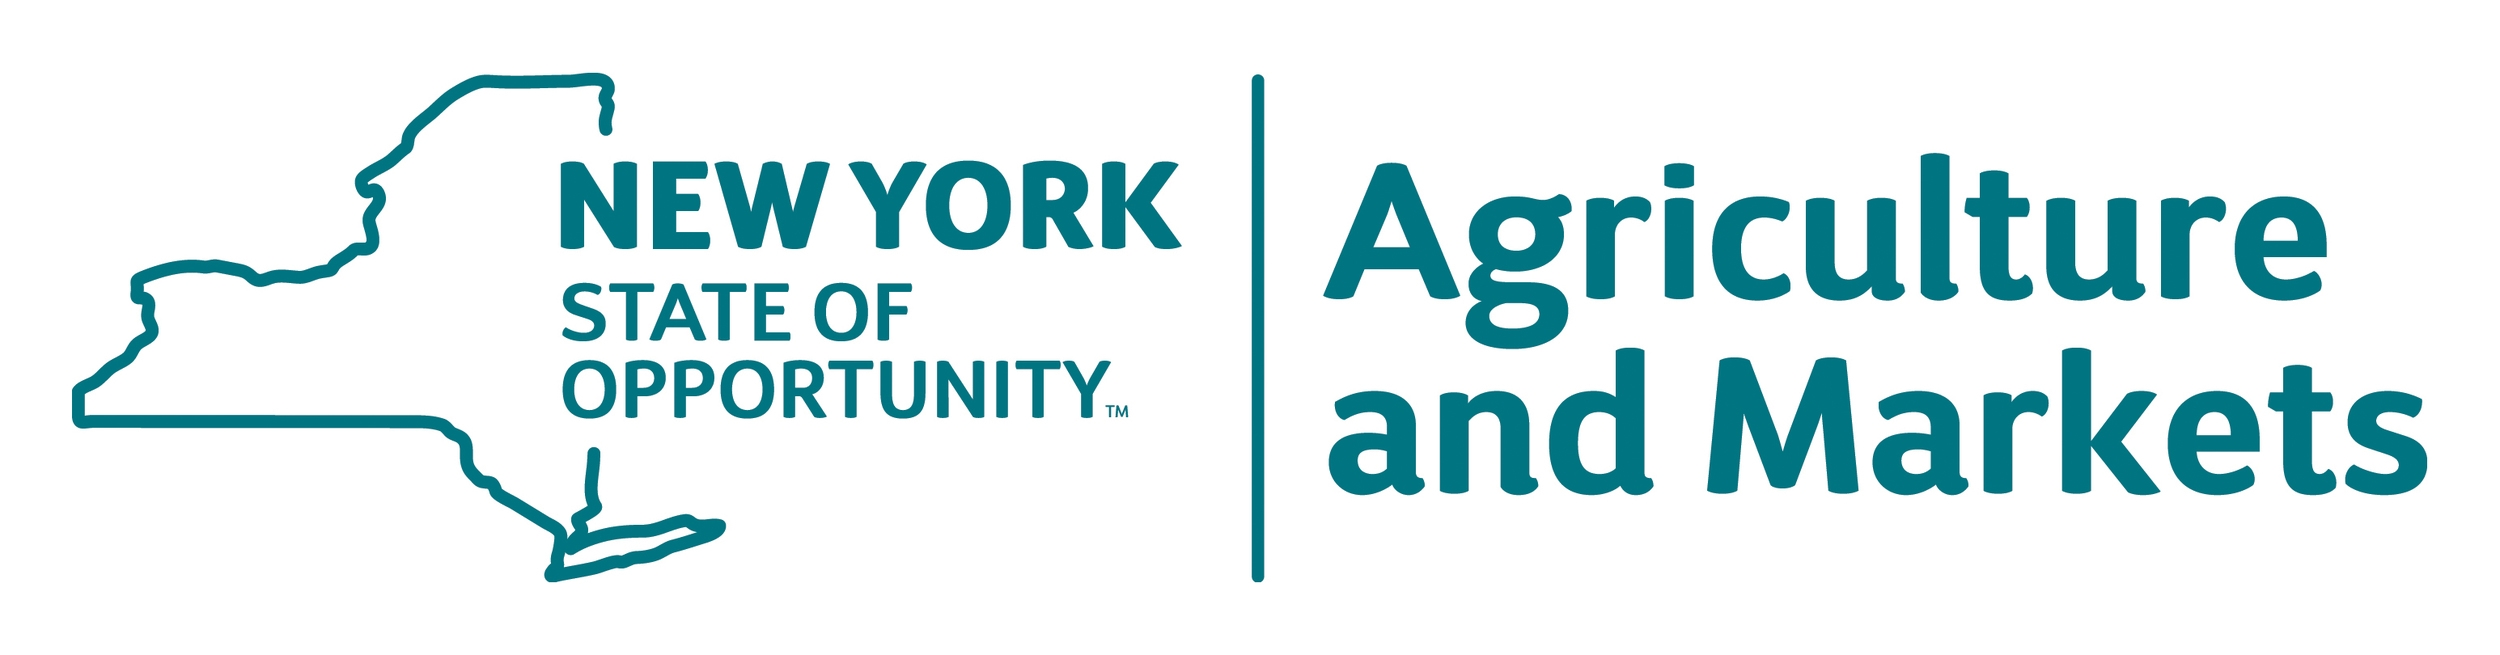 agriculture-marketsSOO 5-15.jpg